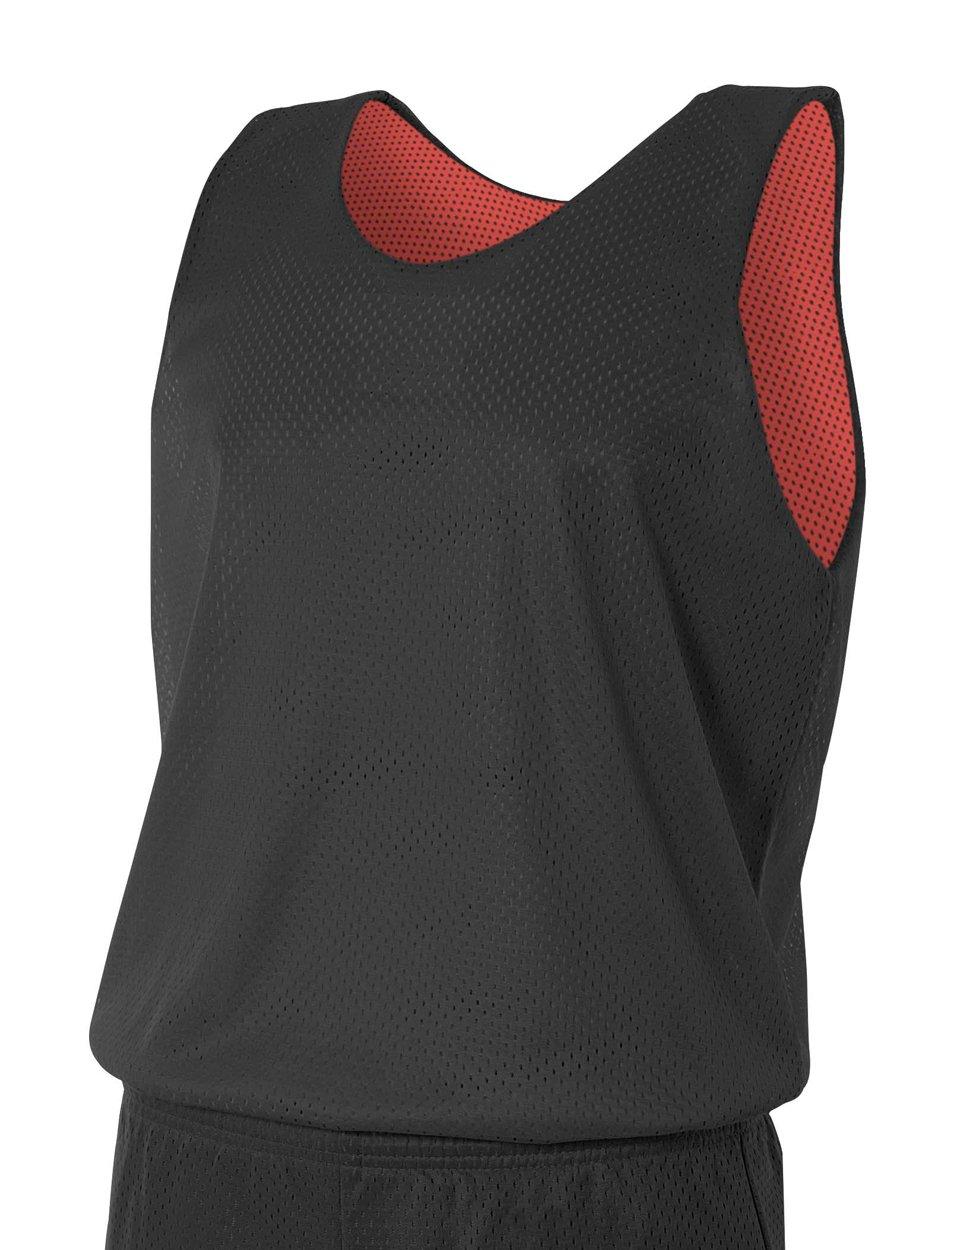 A4 N2206-BKR Reversible Mesh Tank Top, Small, Black/Red